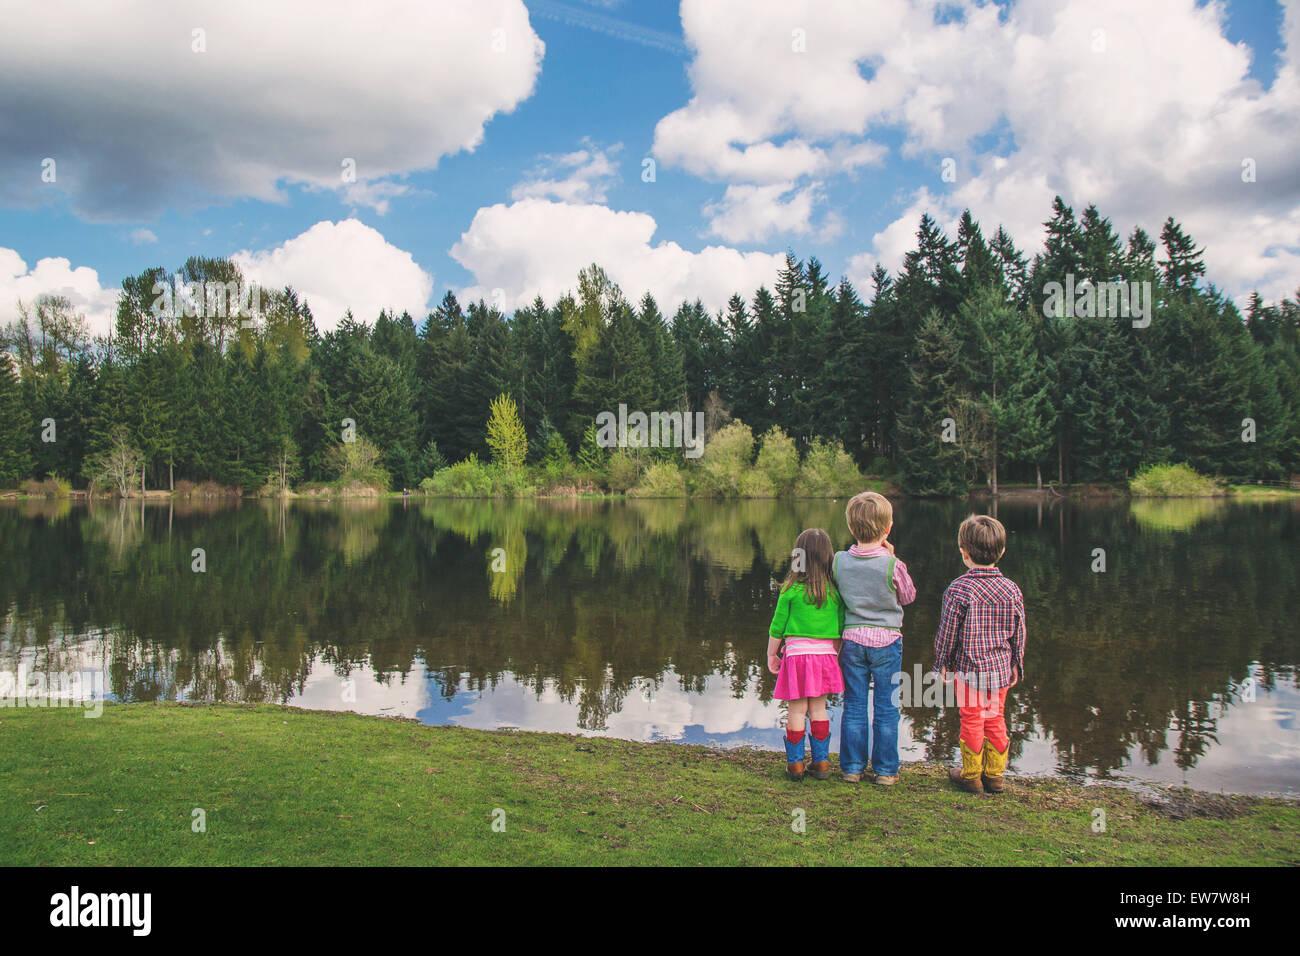 Three children looking at lake - Stock Image